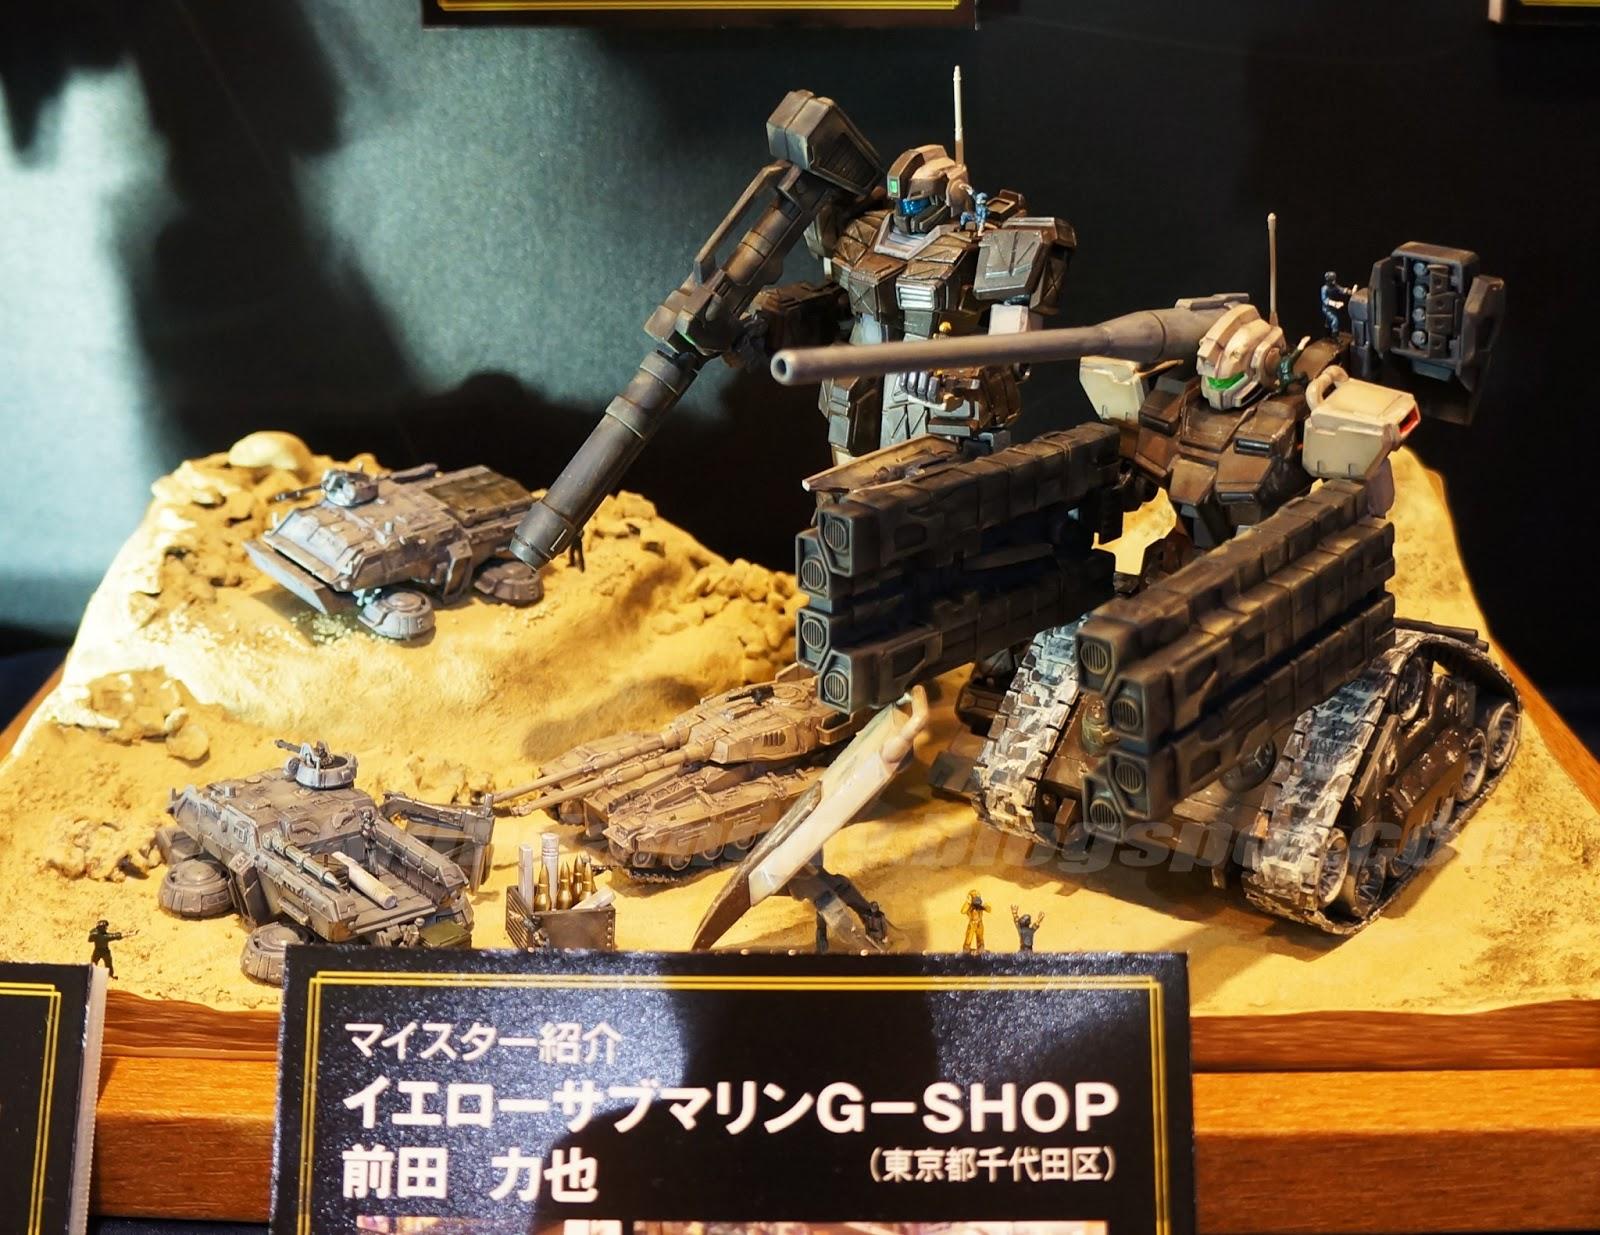 GUNDAM GUY  Bandai Hobby Pro Shop  UC Era Diorama Build   On